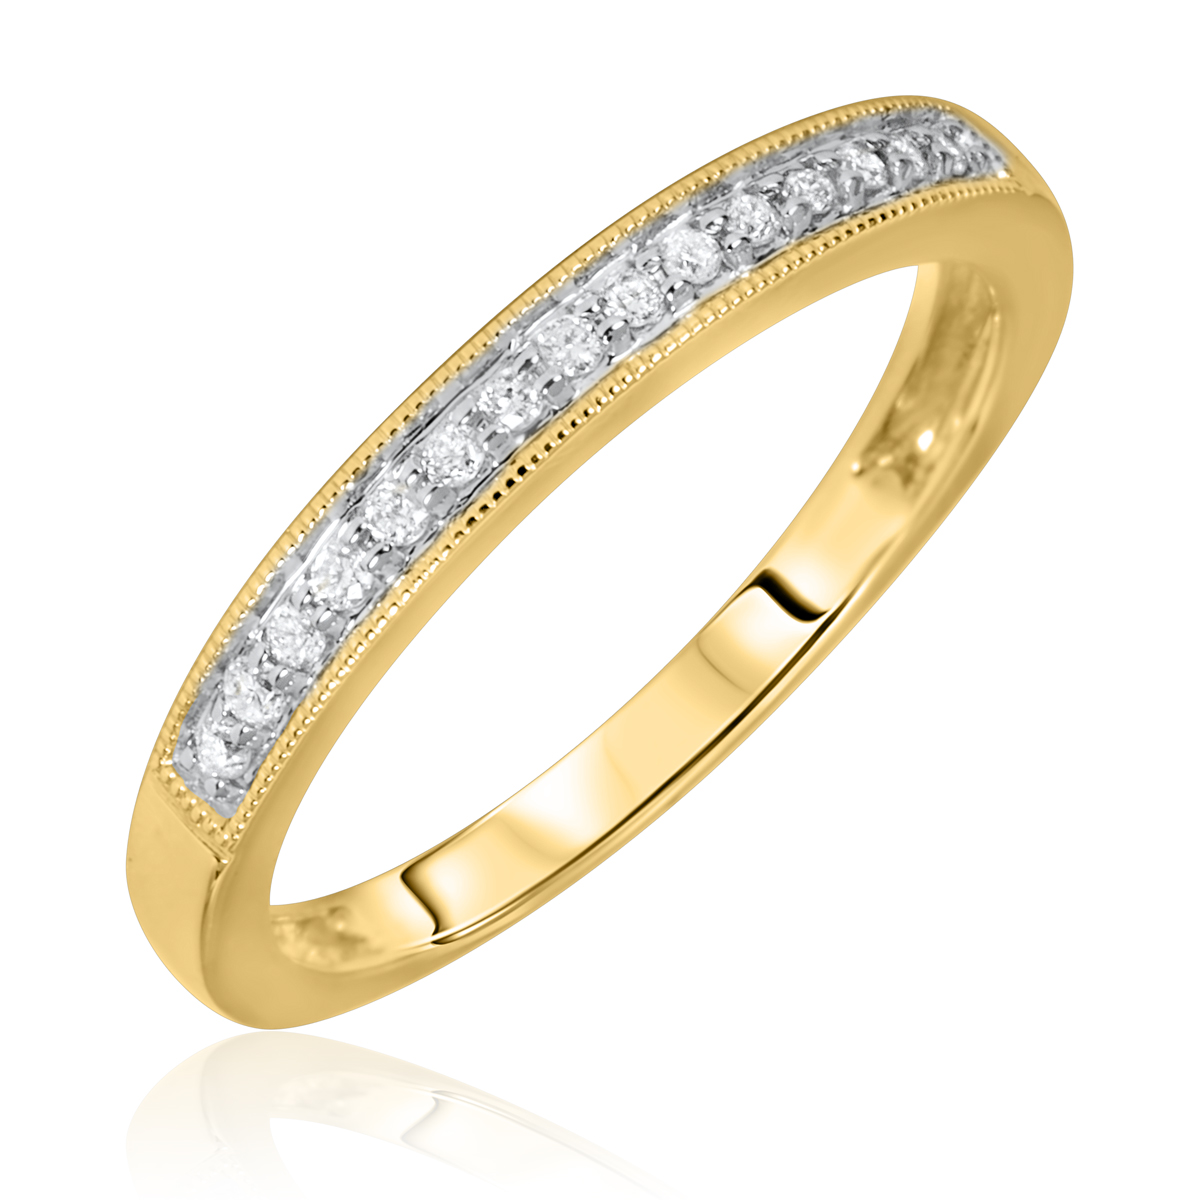 1/10 Carat T.W. Rounds Cut Diamond Ladies Wedding Band 10K Yellow Gold- Size 8